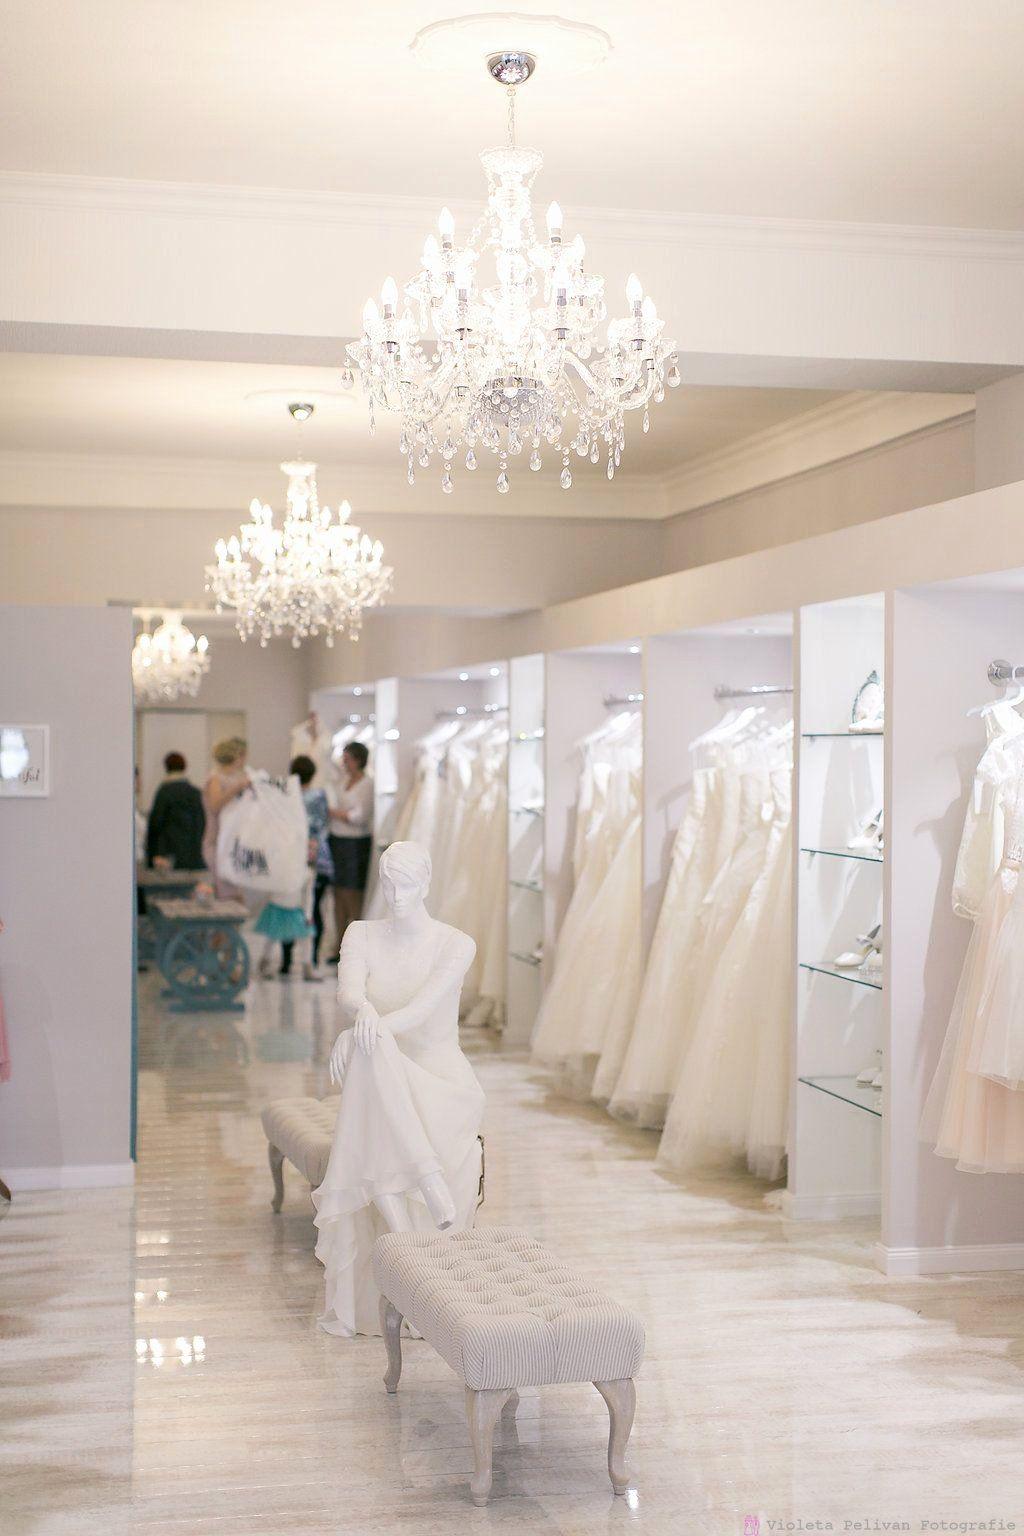 Wedding Retail Stores Unique Bridal Boutique Brautblute Germany Krefeld In 2020 Bridal Boutique Interior Bridal Shop Decor Bridal Shop Interior